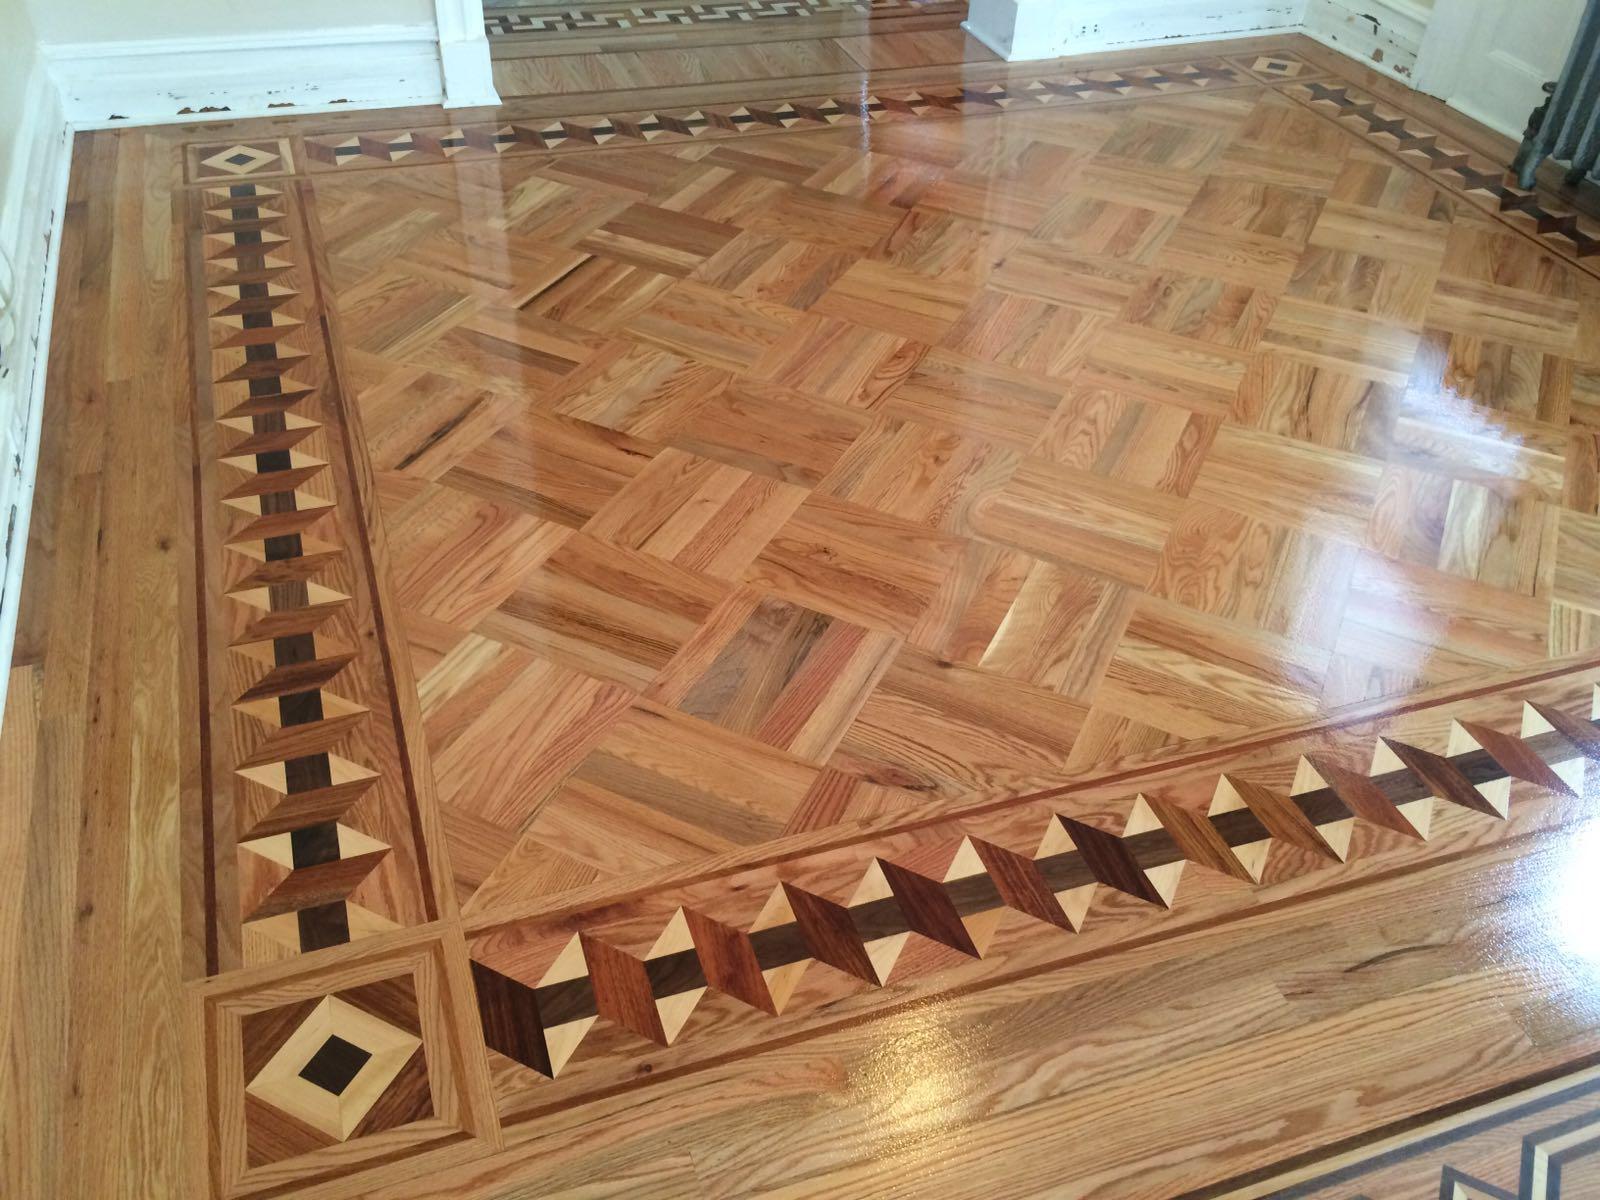 Borders 2000lf wood floor designs e for Hardwood floor designs borders